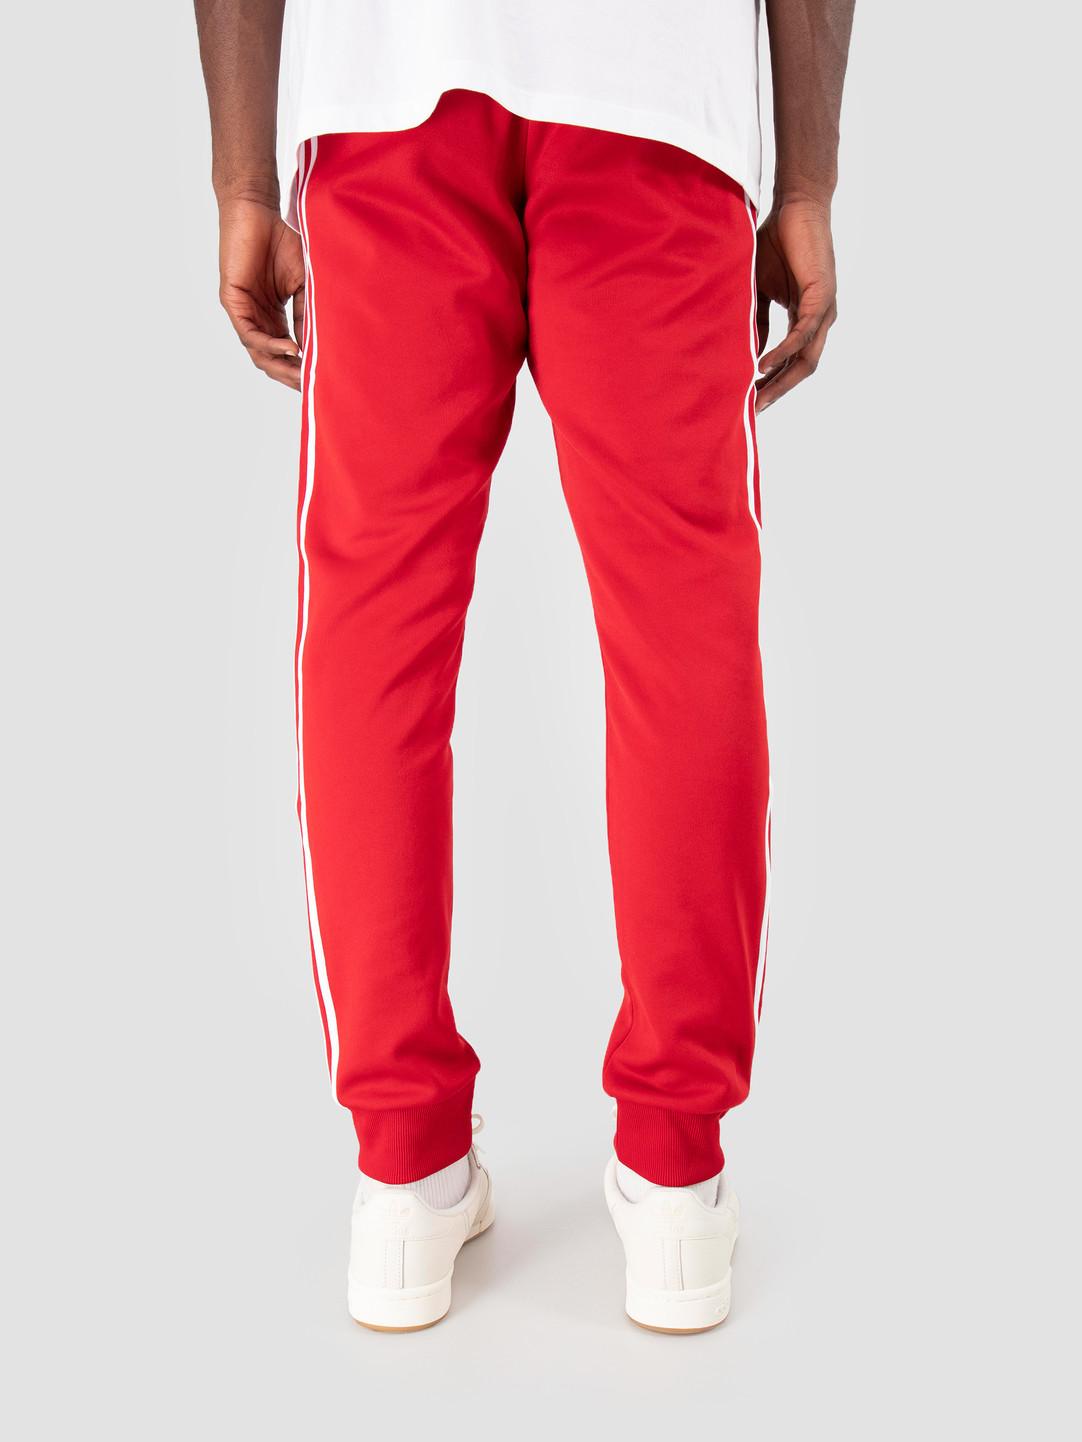 aaebaec3 adidas SST Track Pant Power red DV1534